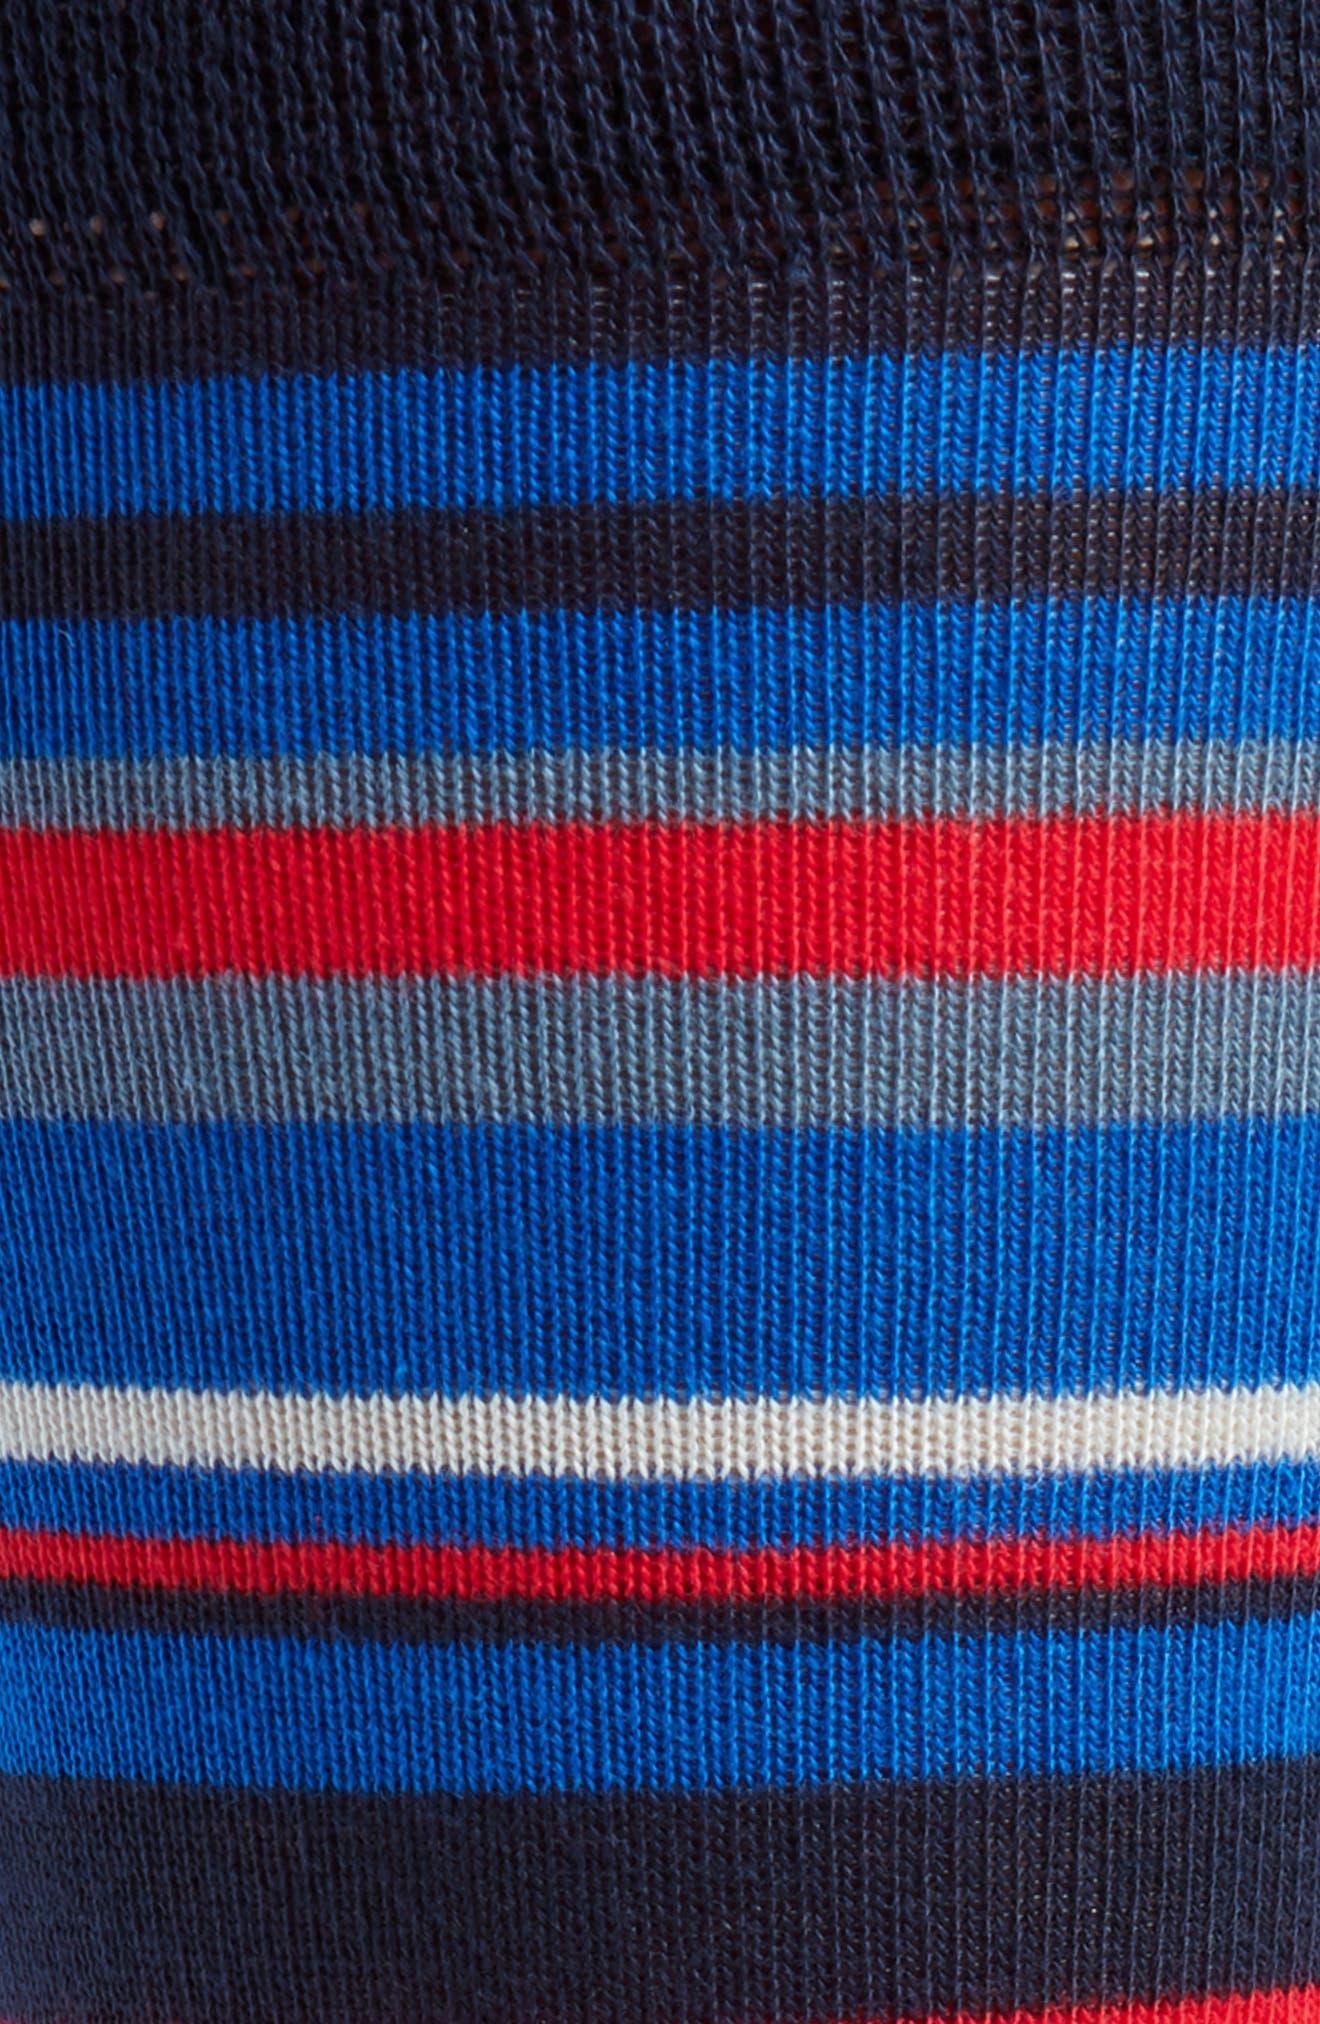 Harisli Stripe Socks,                             Alternate thumbnail 2, color,                             Navy